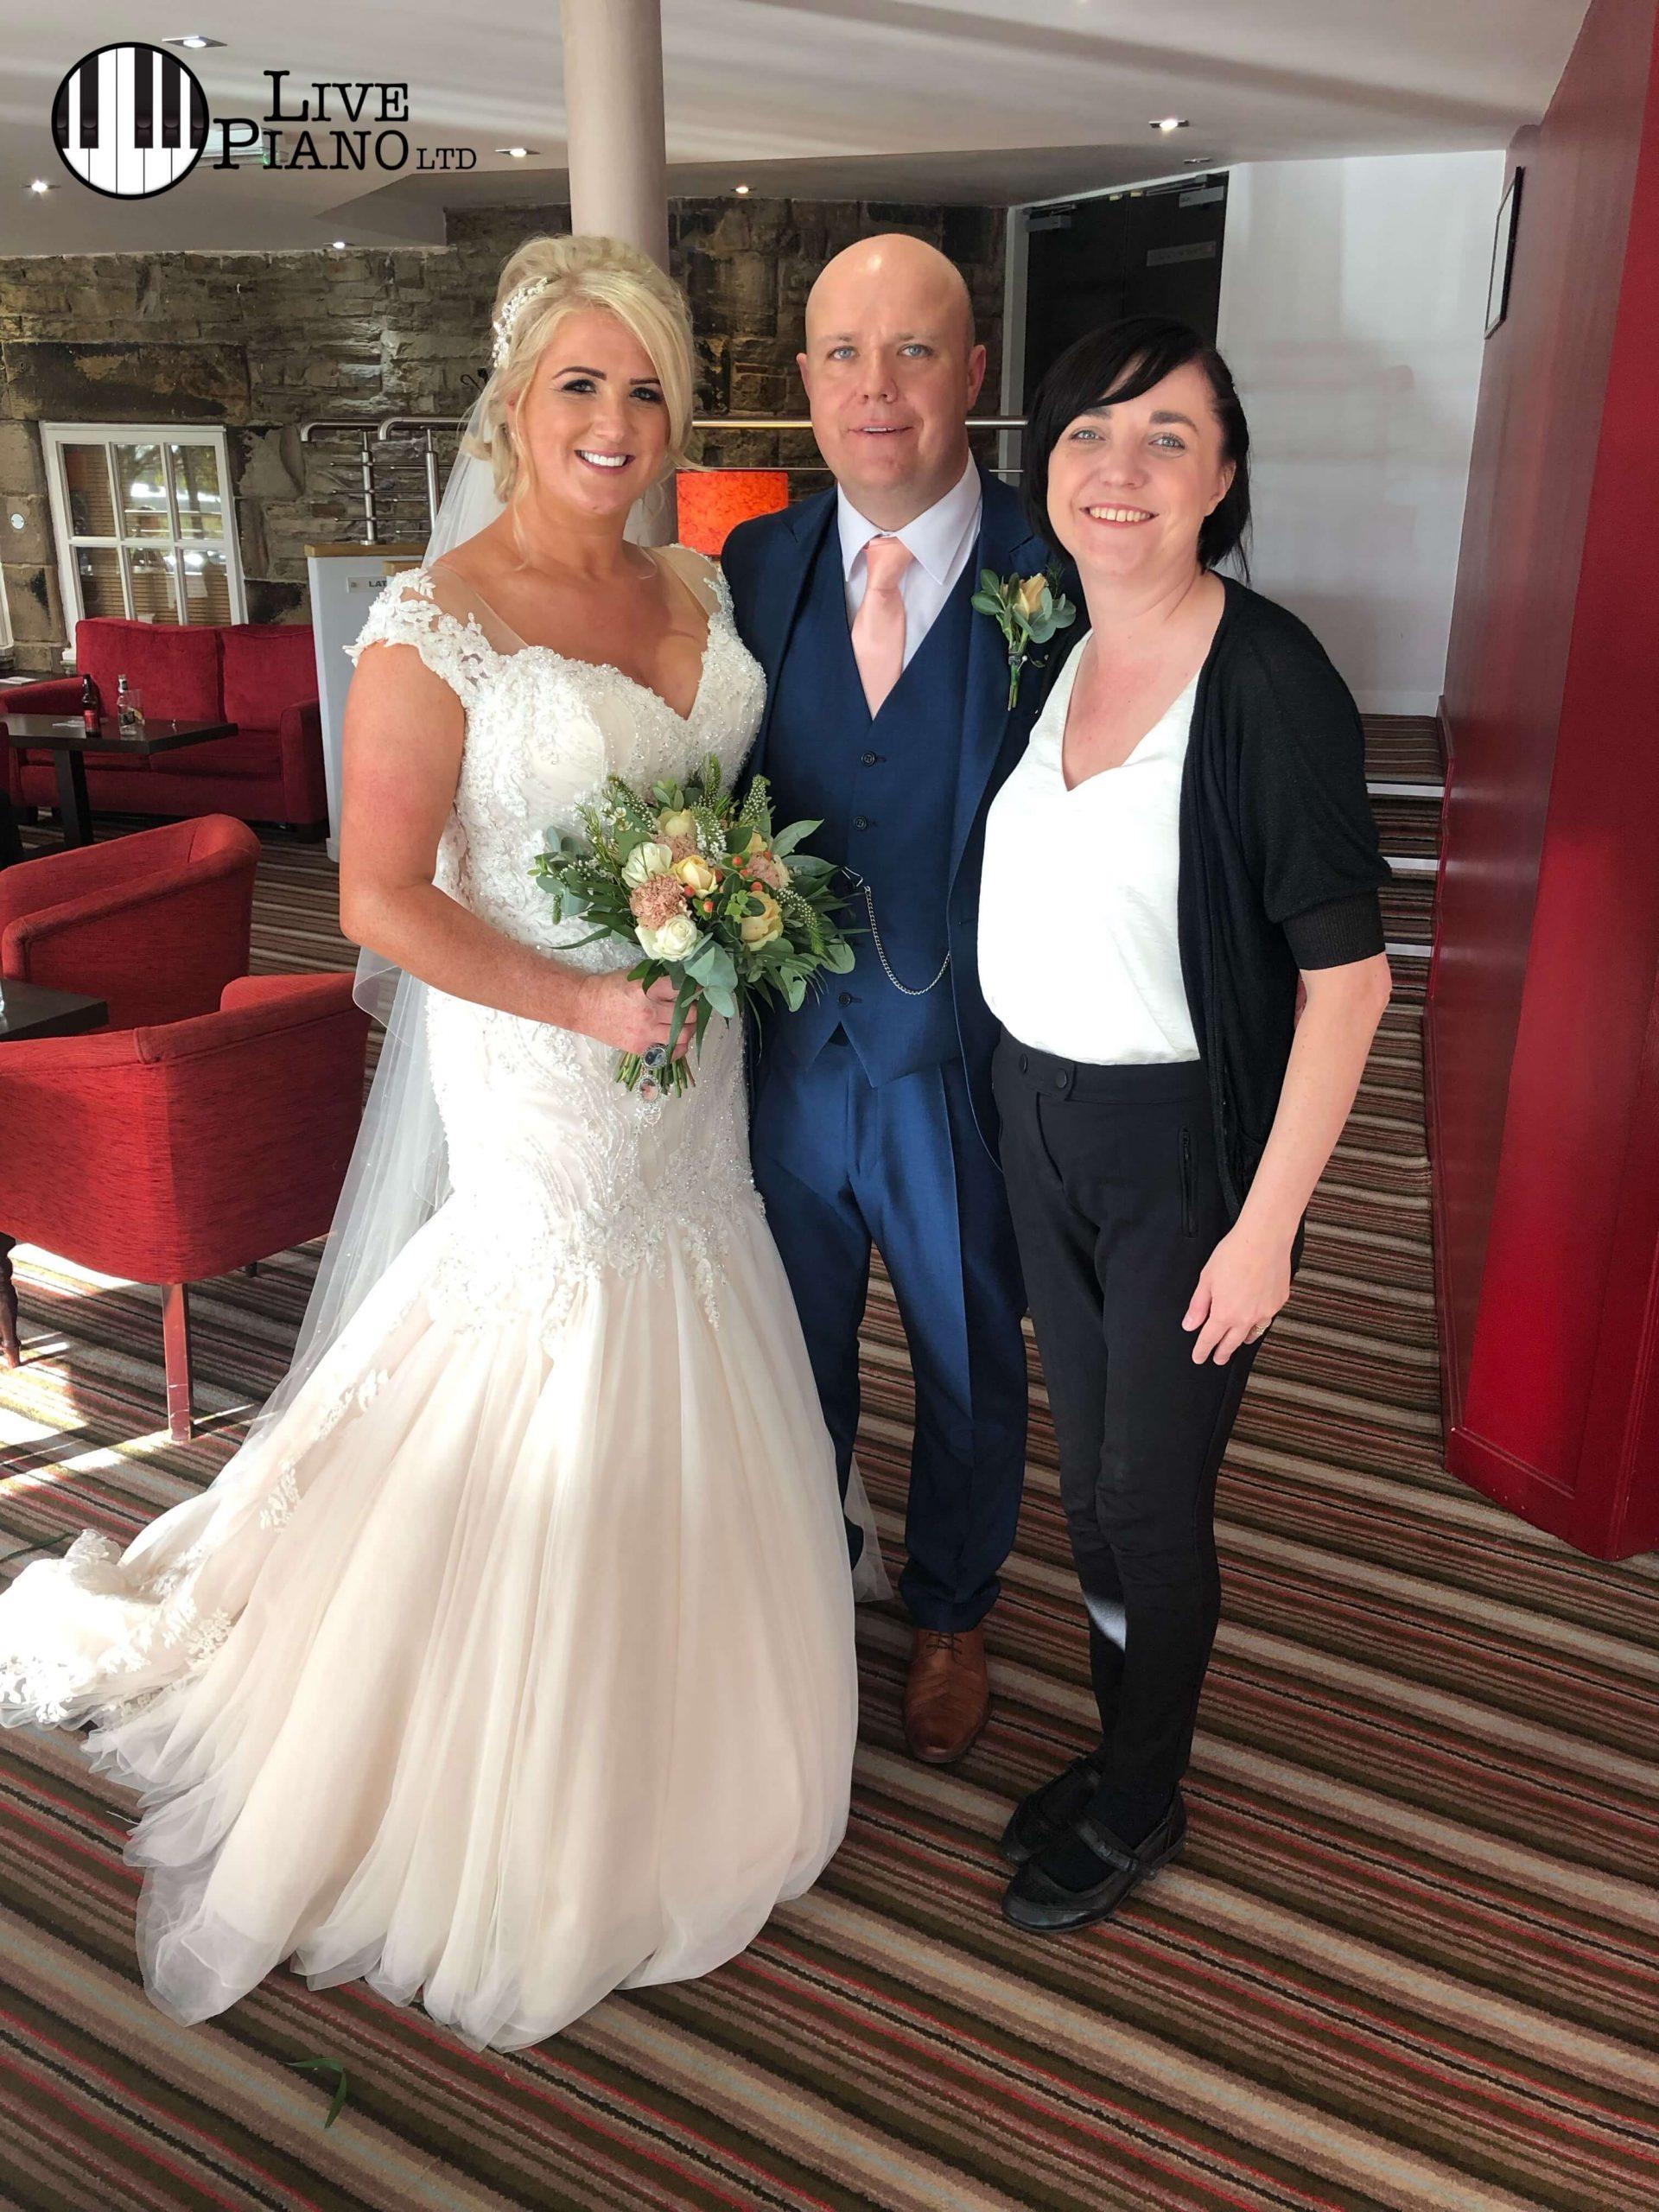 Liz Hendry Wedding Pianist with Mr & Mrs Croaker at Lancashire Manor